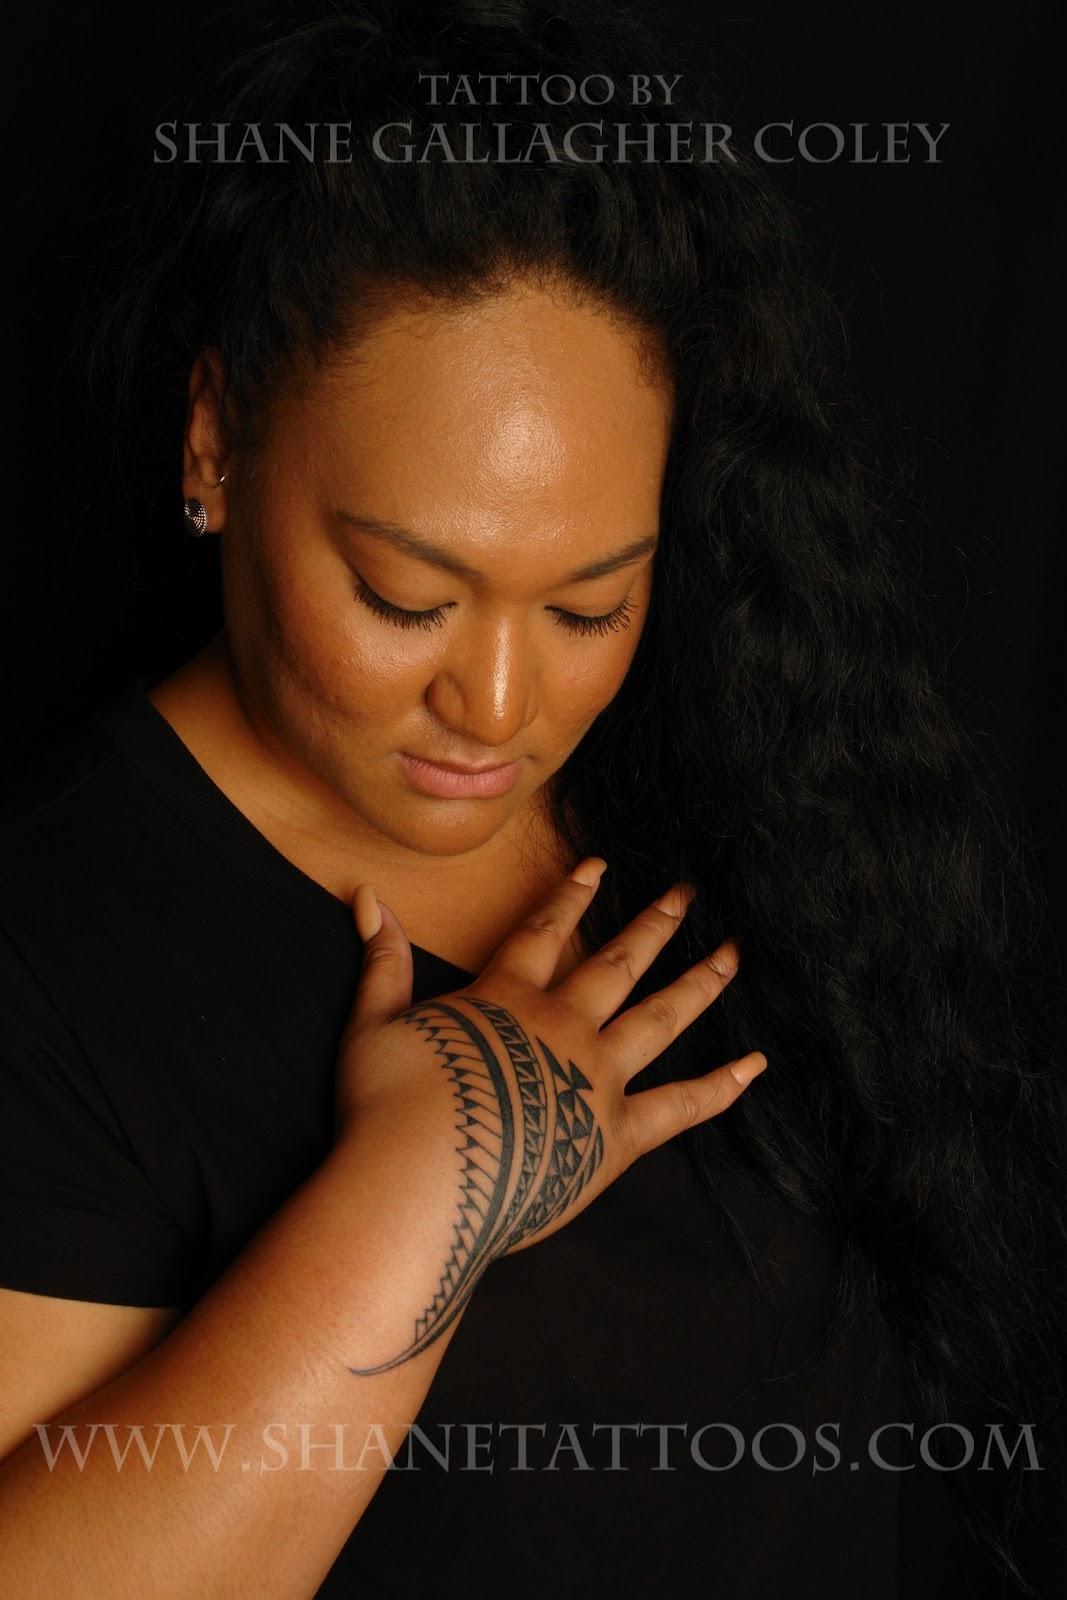 Polynesian Tattoo On Females Hands